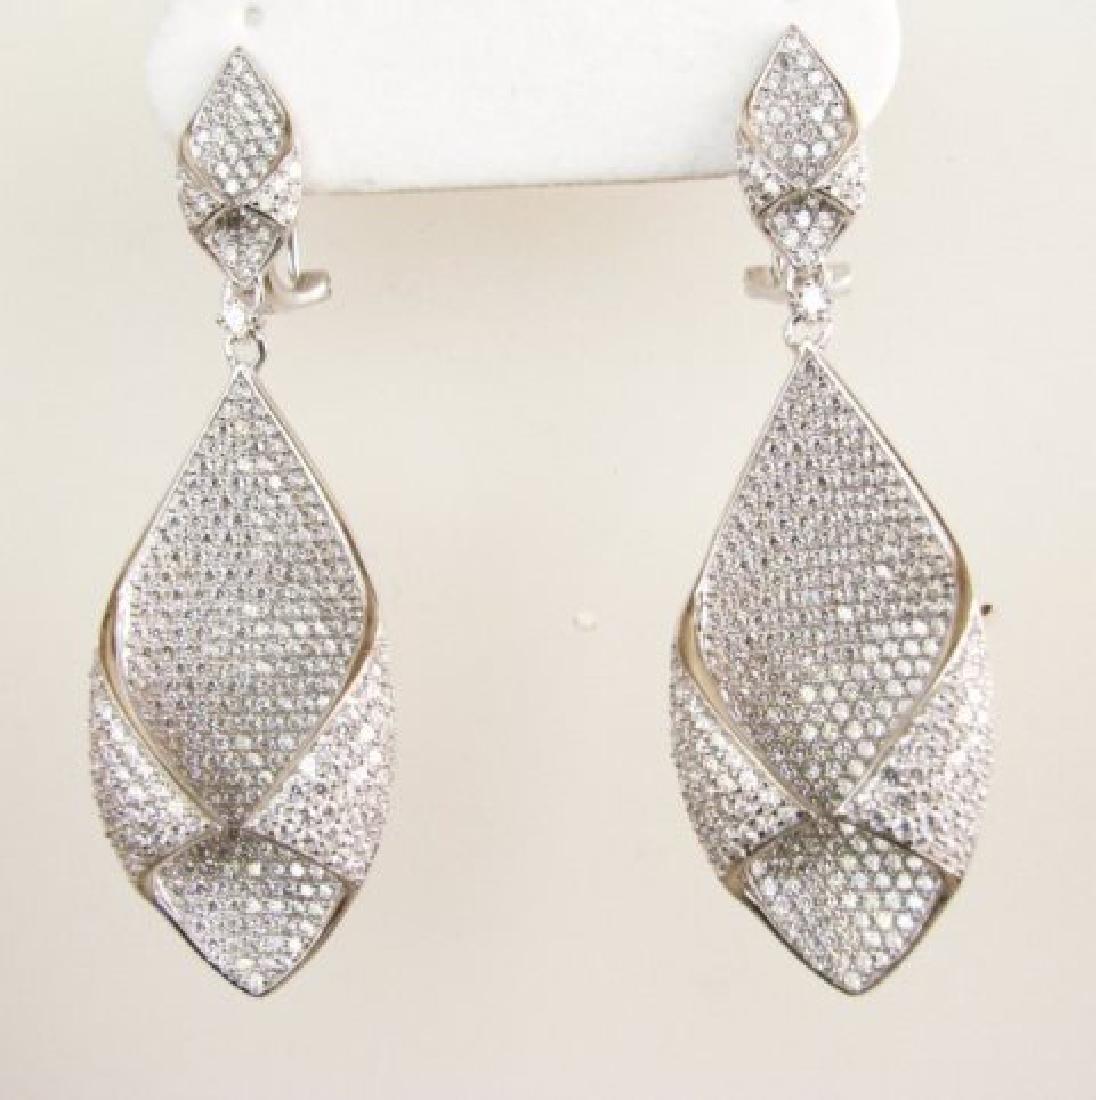 Creation Diamond Chandeliers Ear 5.24Ct 18k W/g Overlay